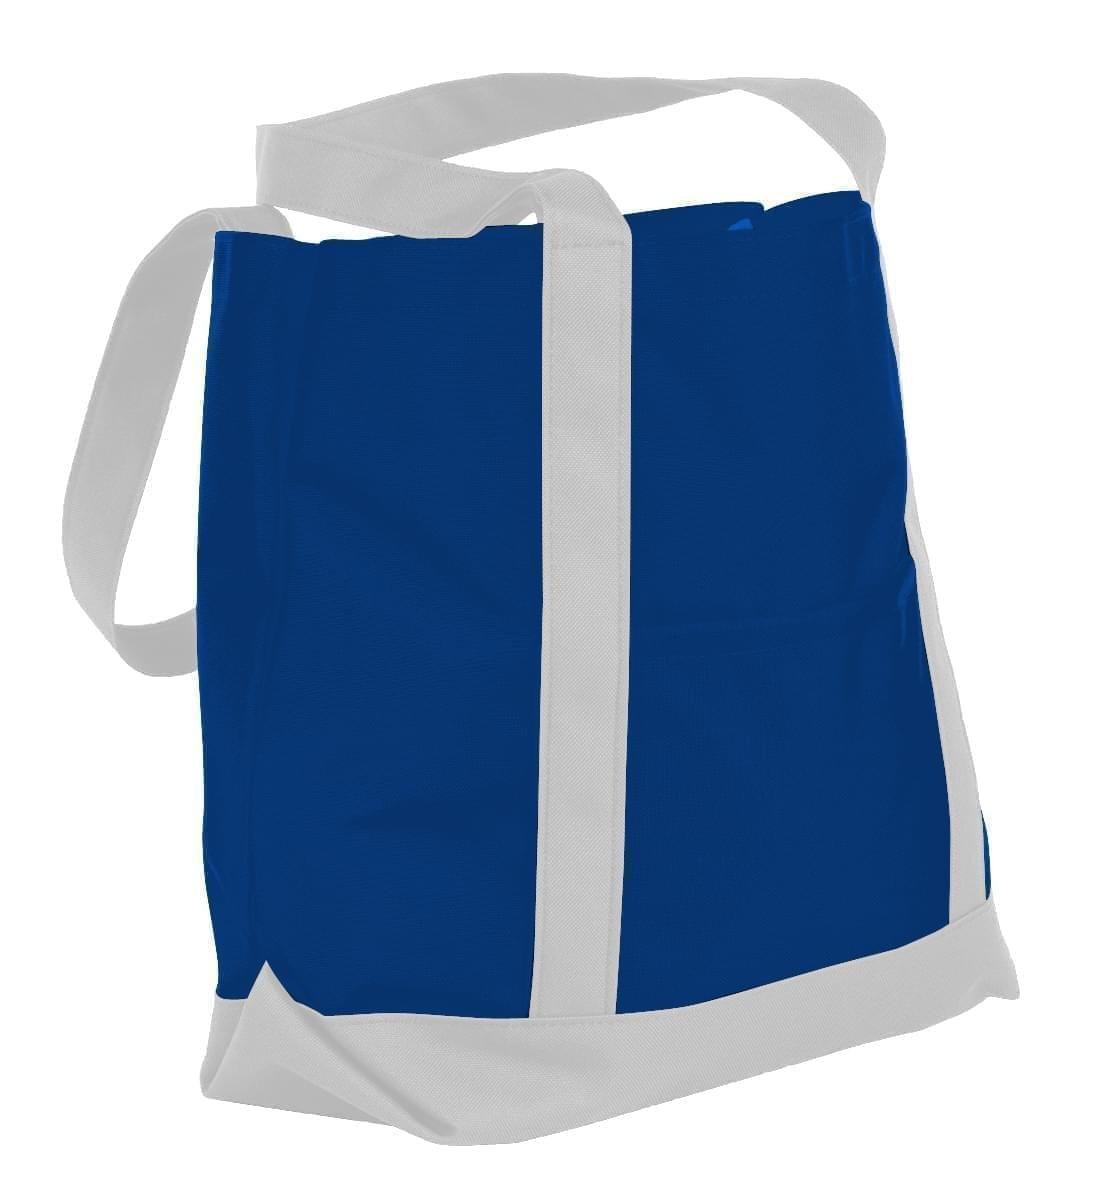 USA Made Canvas Fashion Tote Bags, Royal Blue-White, XAACL1UAFP